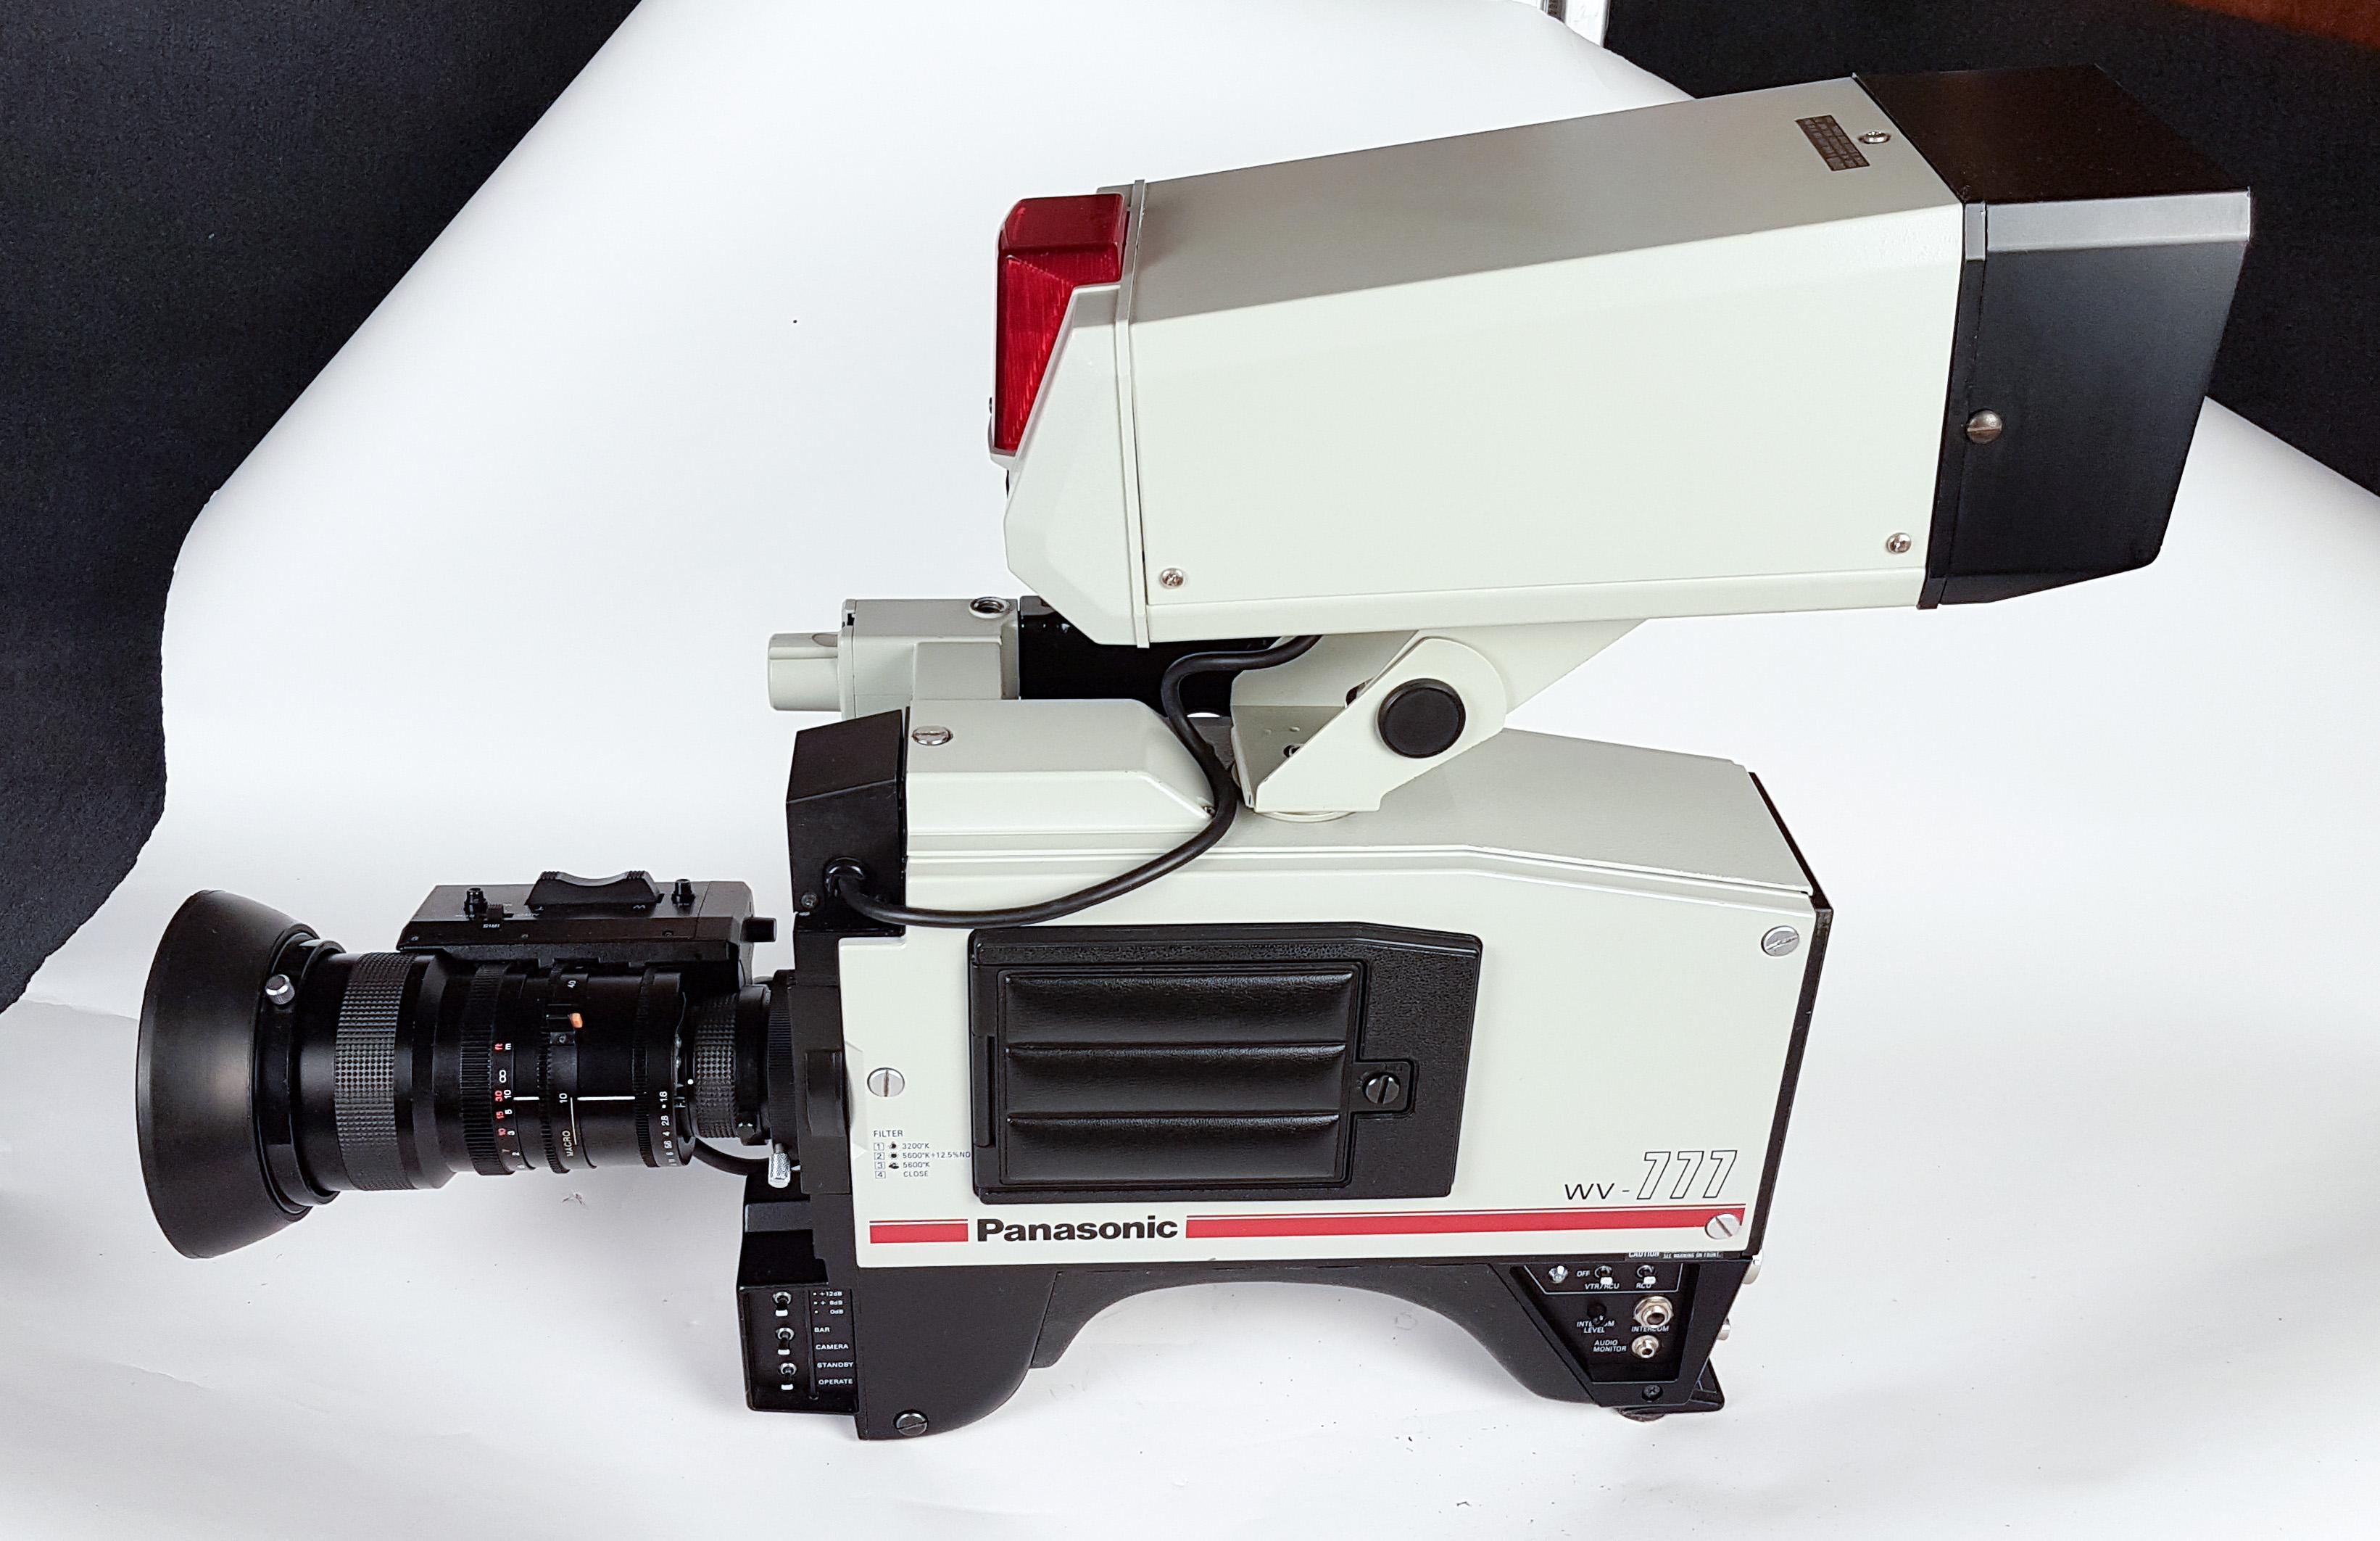 Panasonic WV-777 large viewfinder -  (1 von 6)